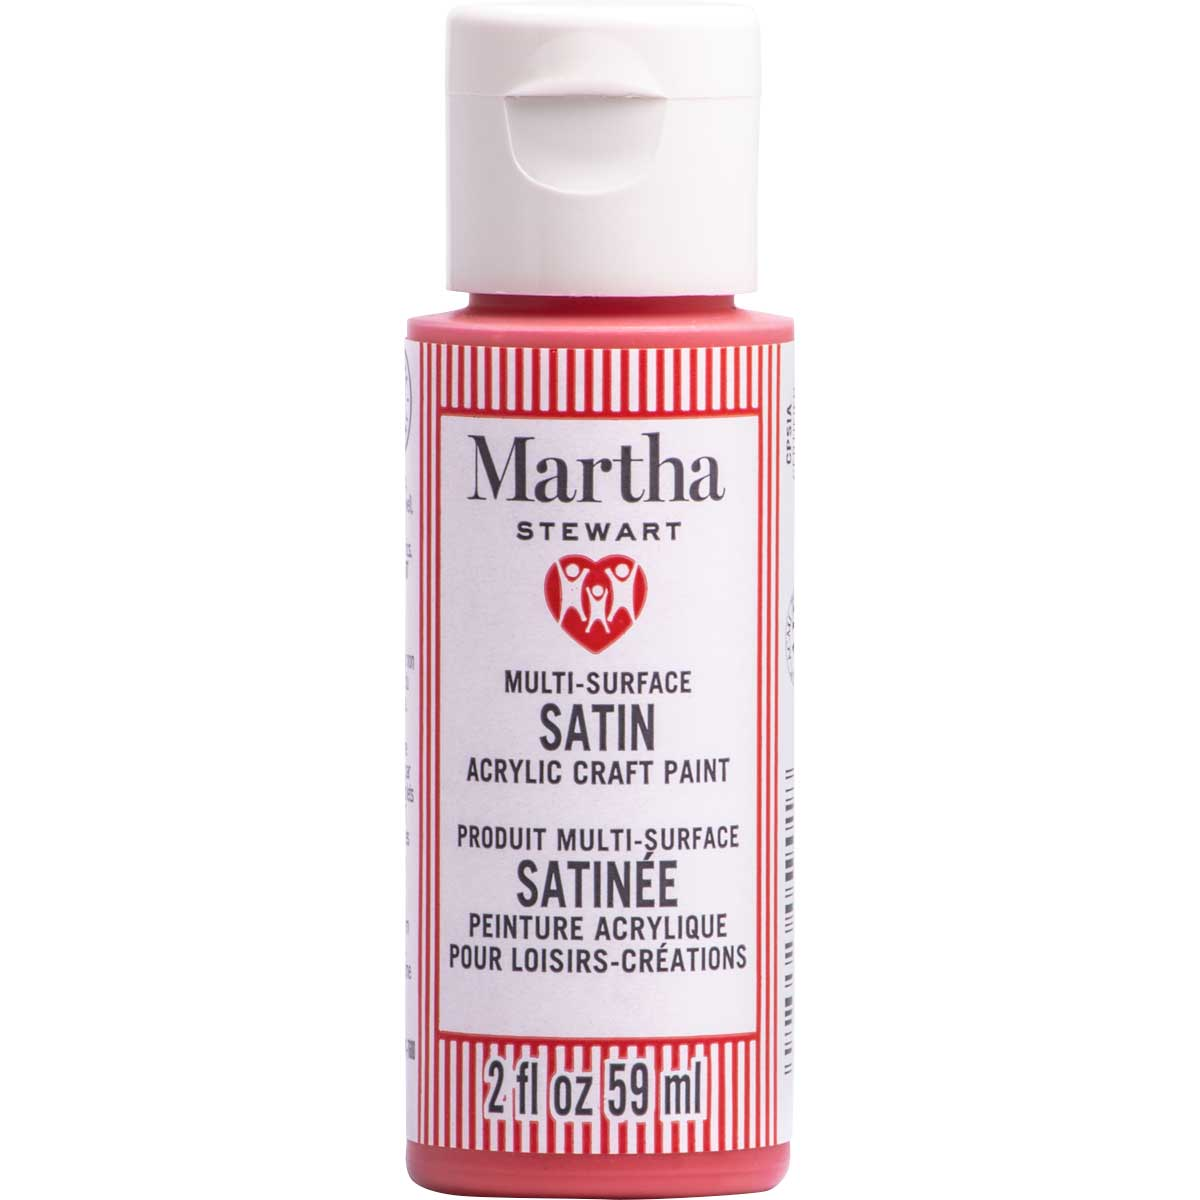 Martha Stewart ® Multi-Surface Satin Acrylic Craft Paint CPSIA - Strawberry, 2 oz. - 5901